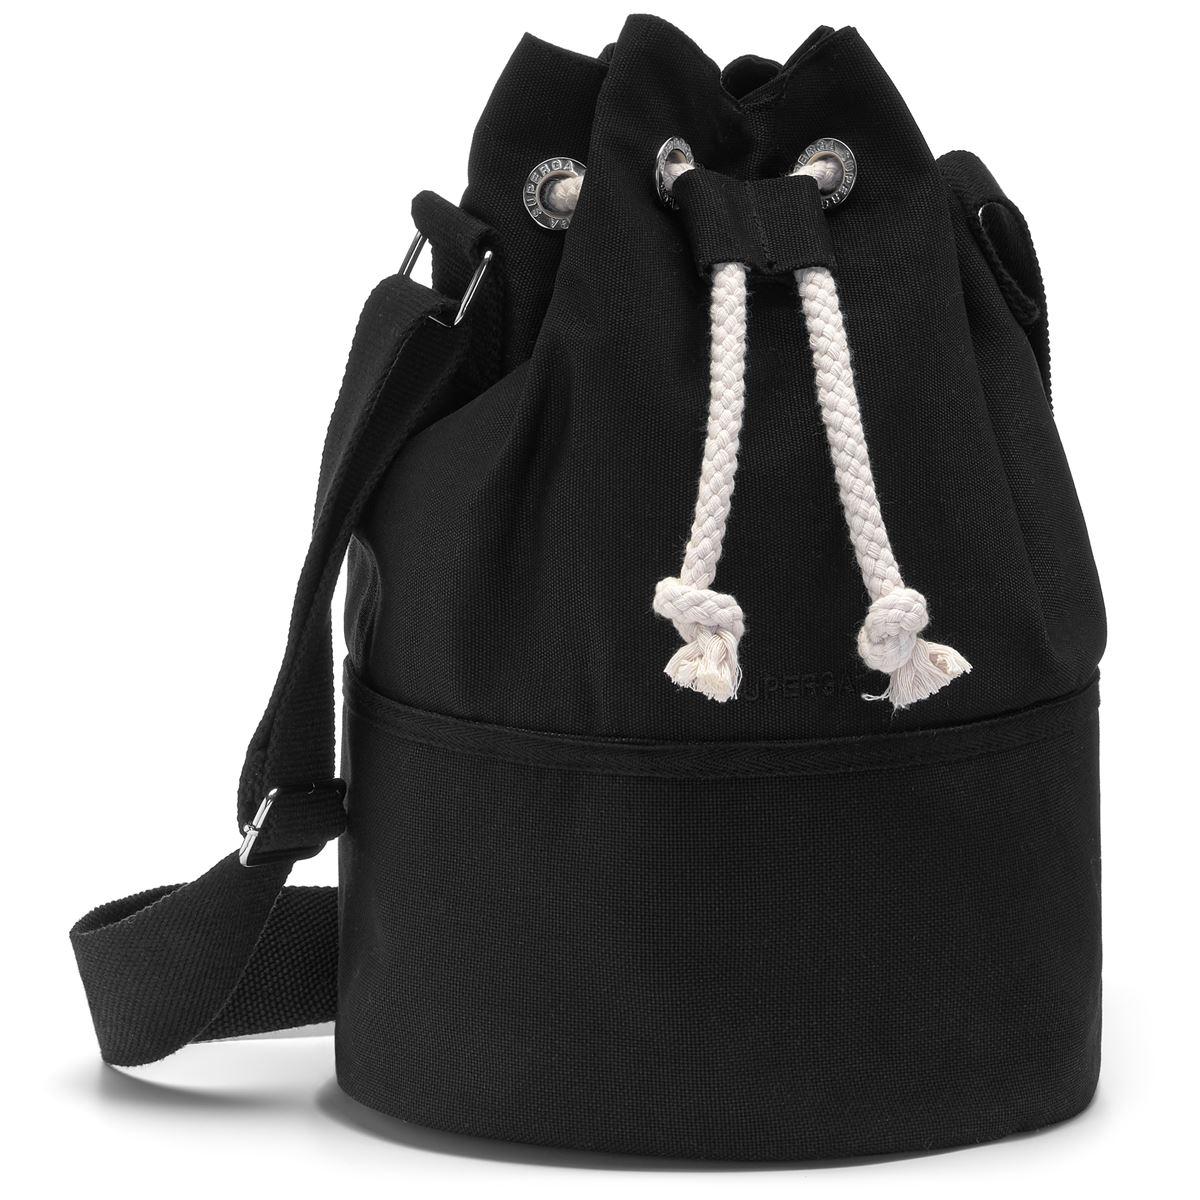 Italian Bags Superga for men and women-S4113FW